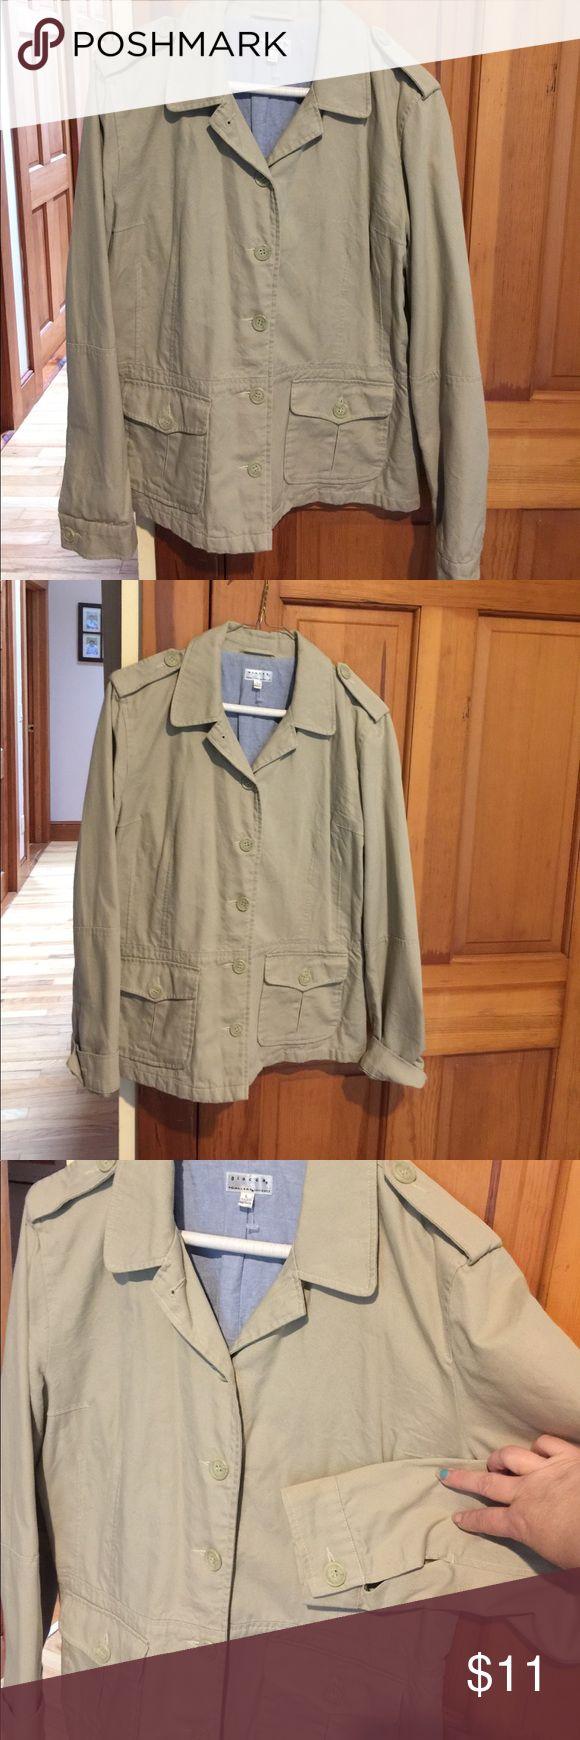 25 Best Ideas About Tan Jacket On Pinterest Maroon